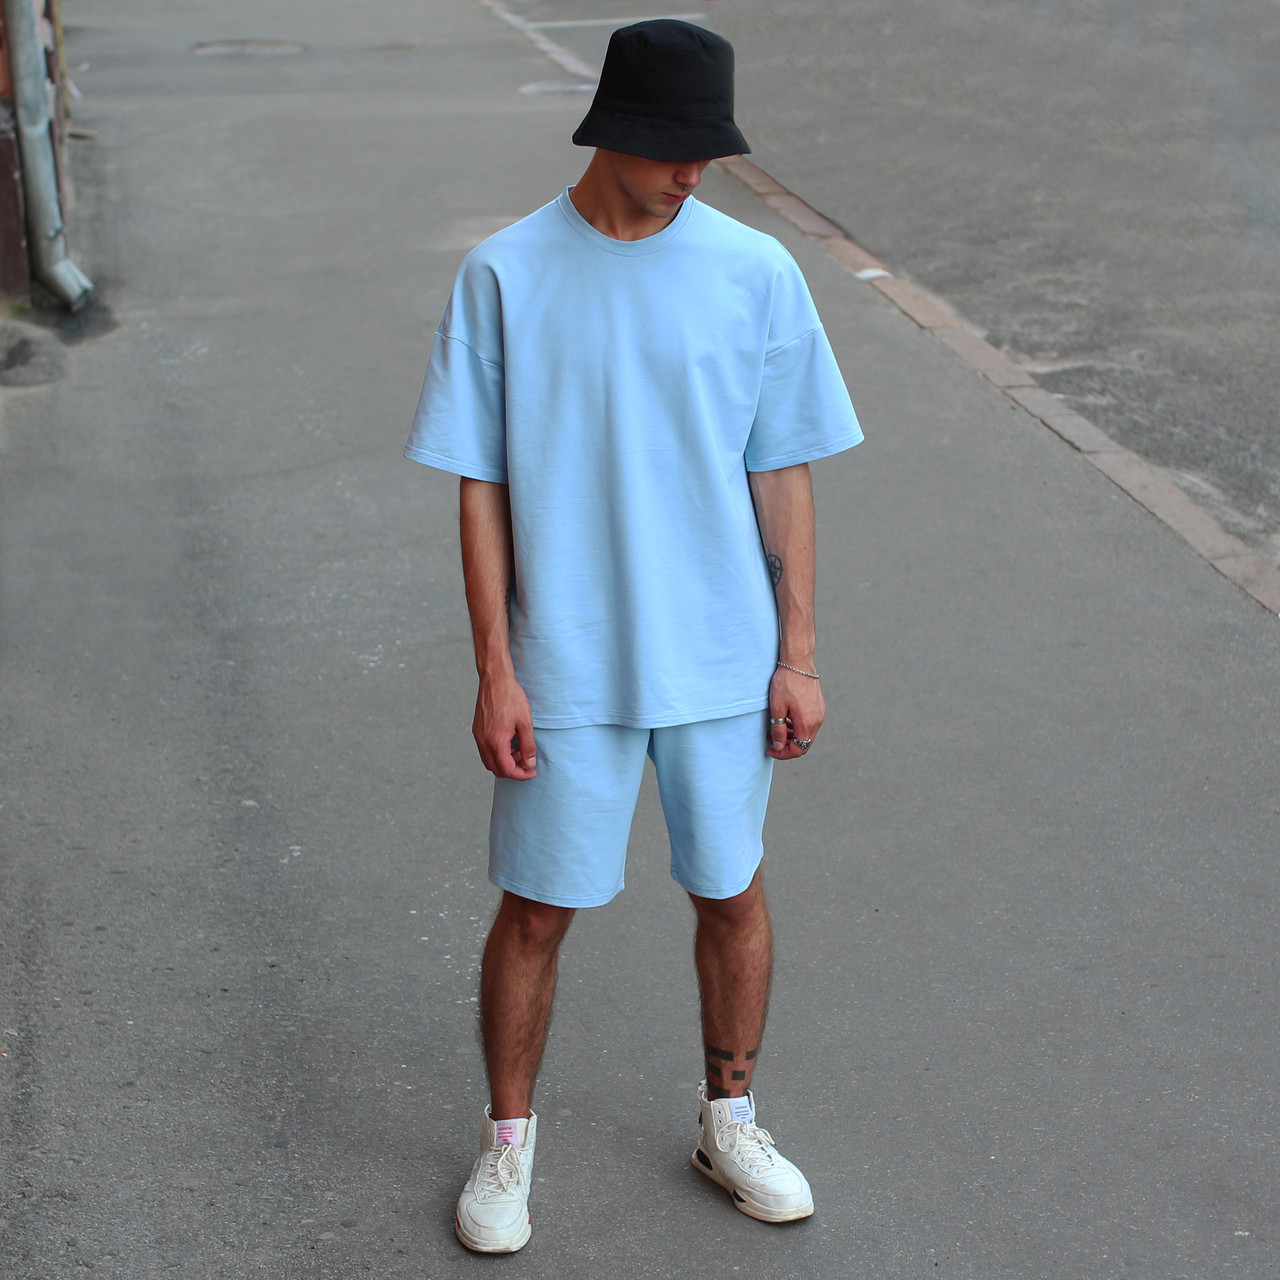 Футболка мужская голубая Quil (Квил) бренд Тур размер